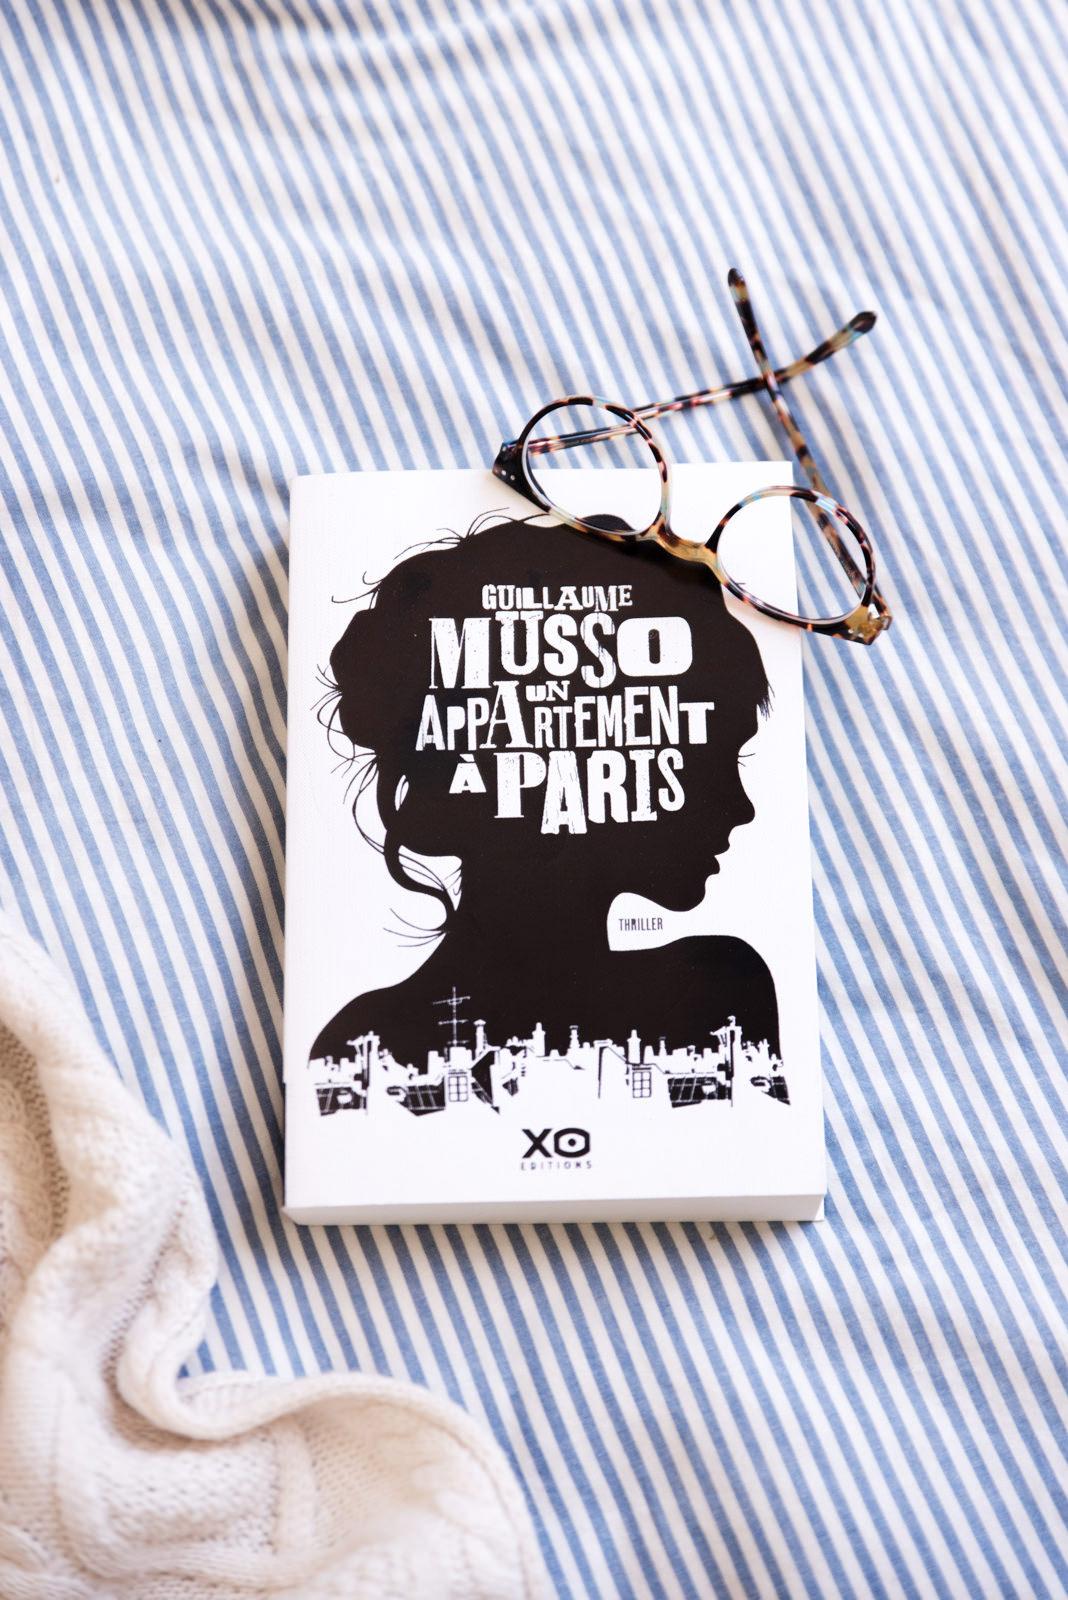 Blog-Mode-And-The-City-Lifestyle-Cinq-Petites-Choses-230-Guillaume-Musso-Appartement-Paris